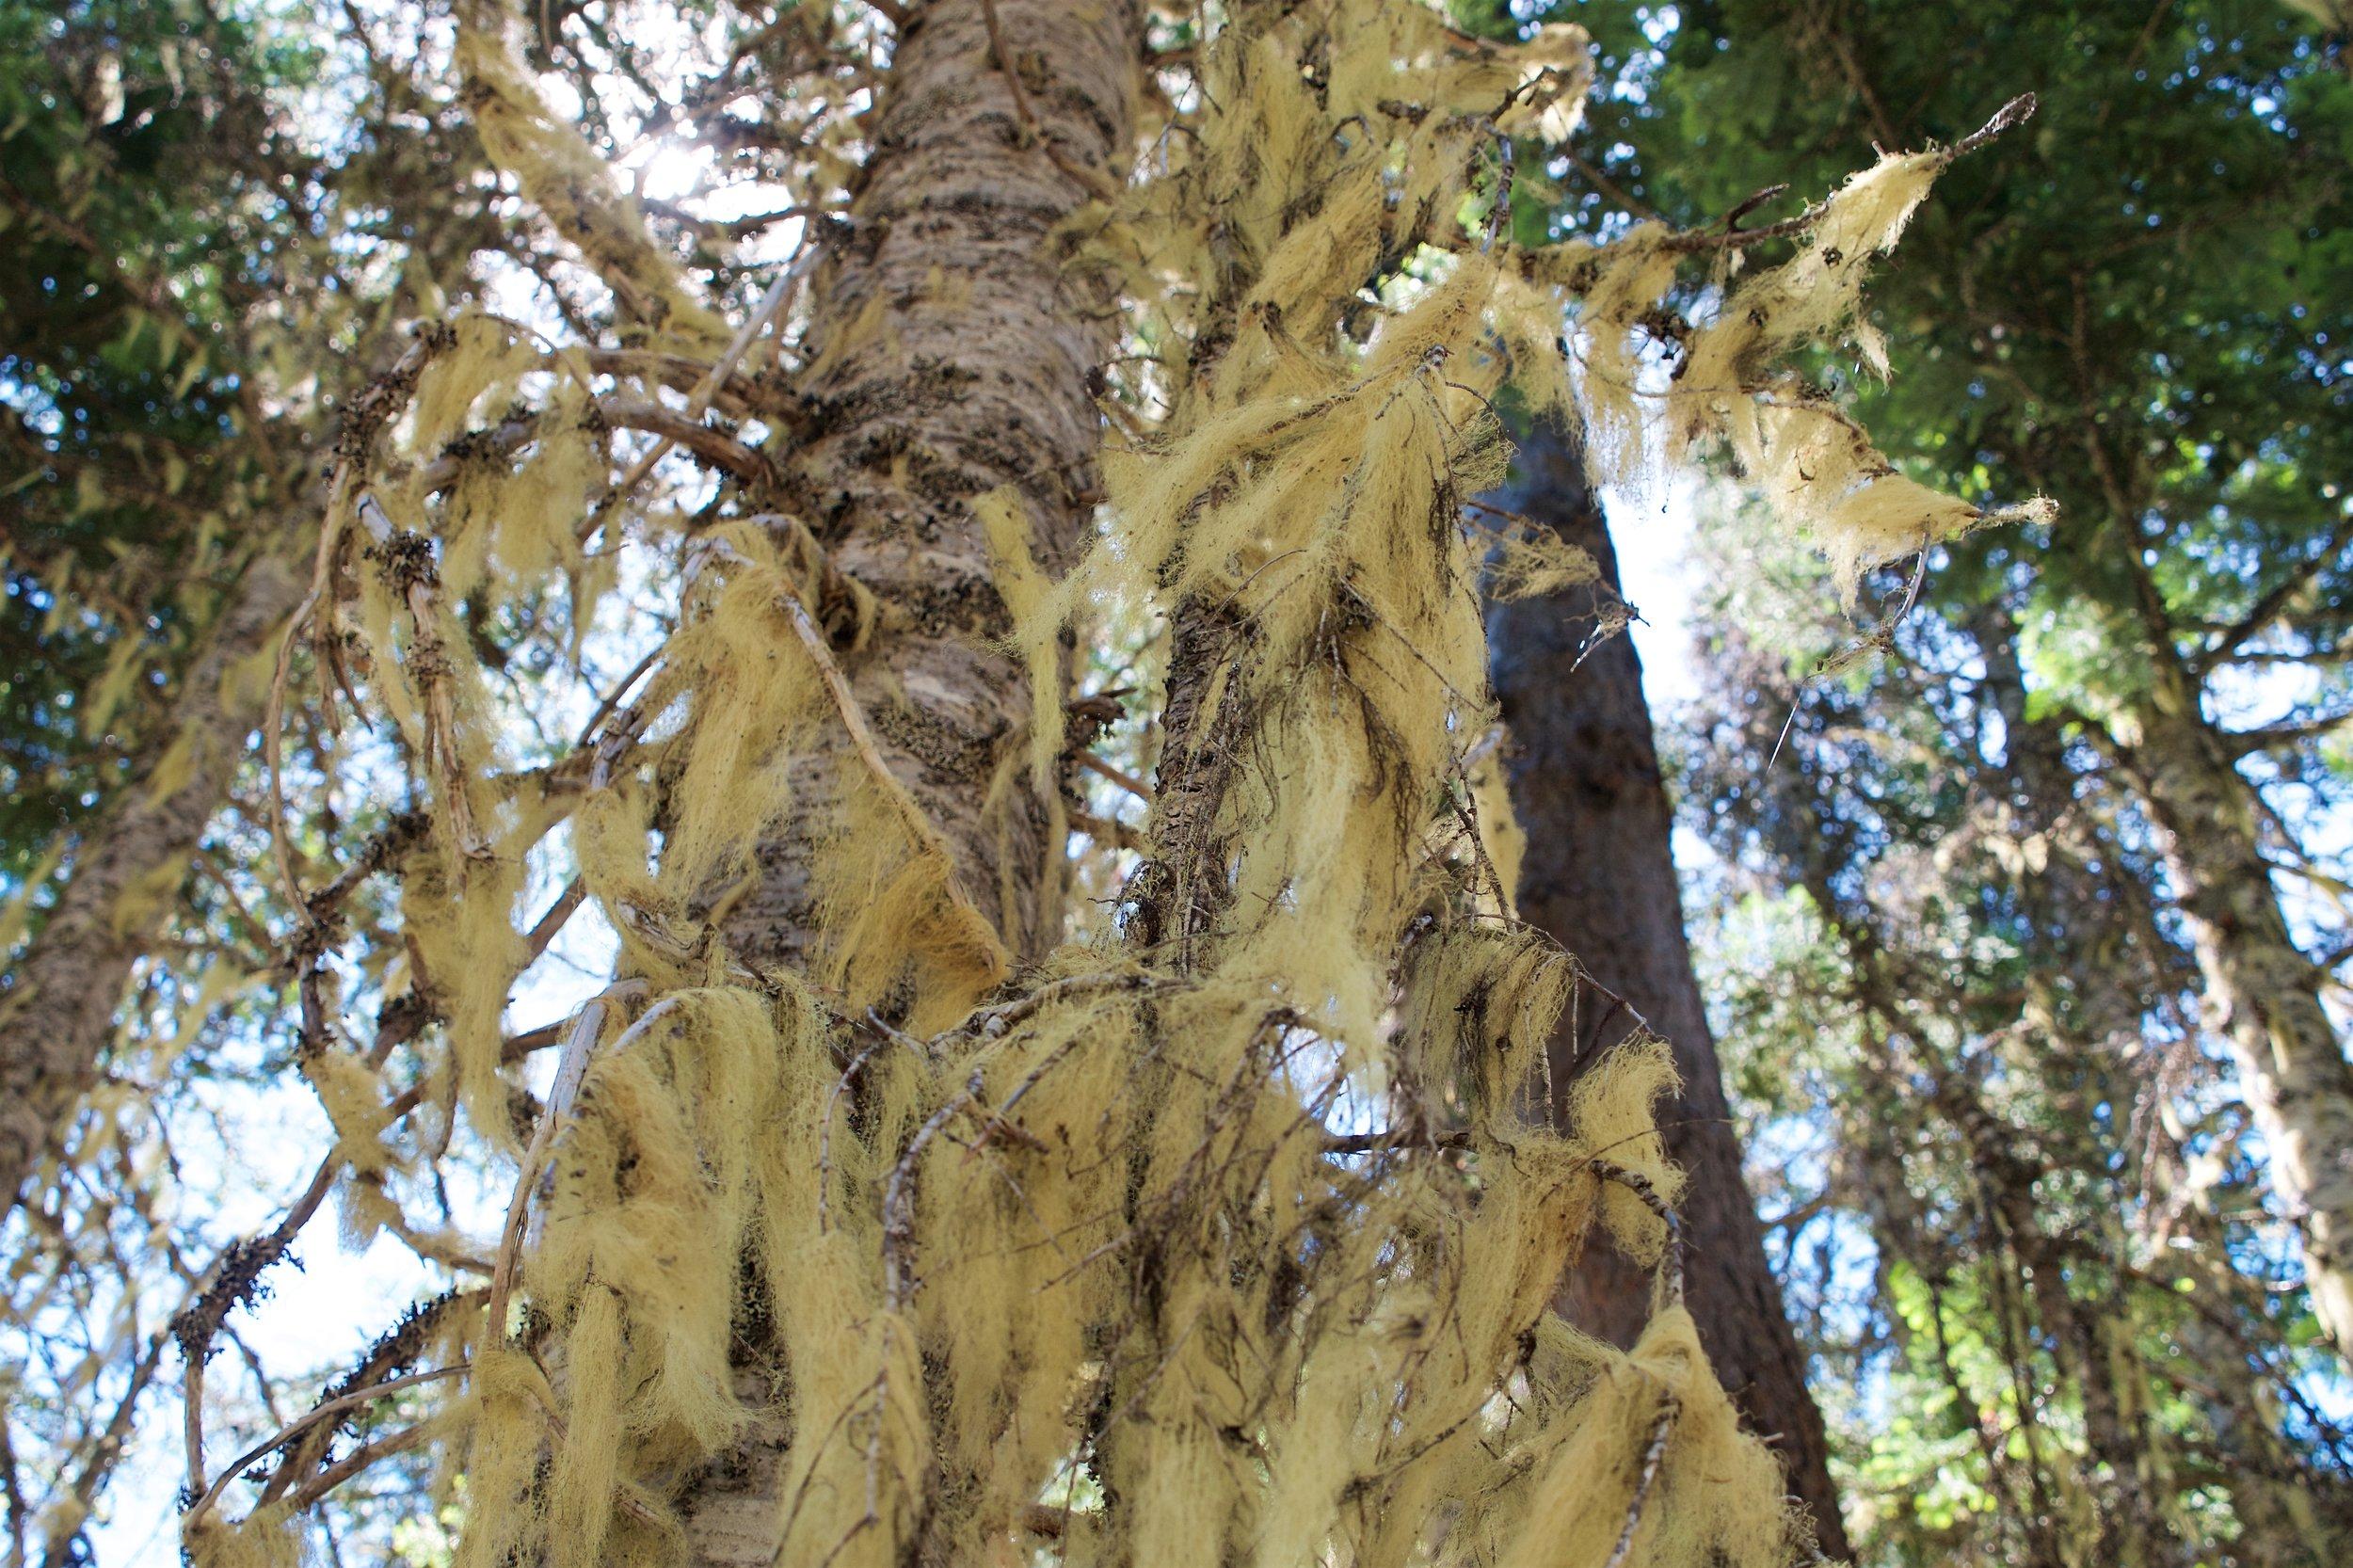 Lots of stringy lichen